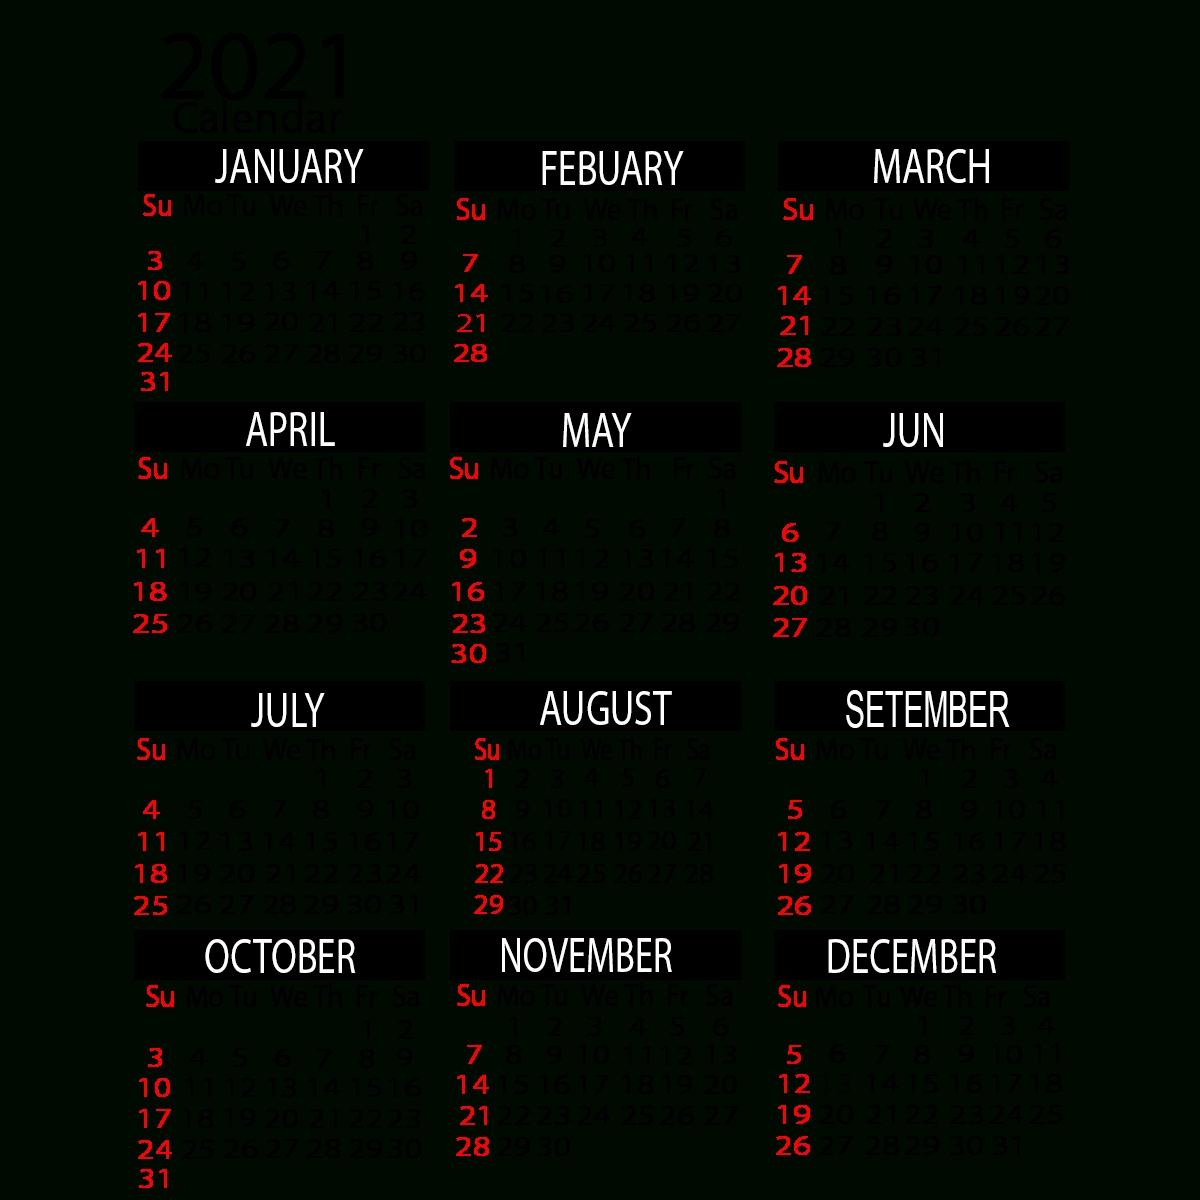 2021 Yearly Calendar Printable | Calendar 2021 with regard to 2021 Calendar With Date Boxes Photo